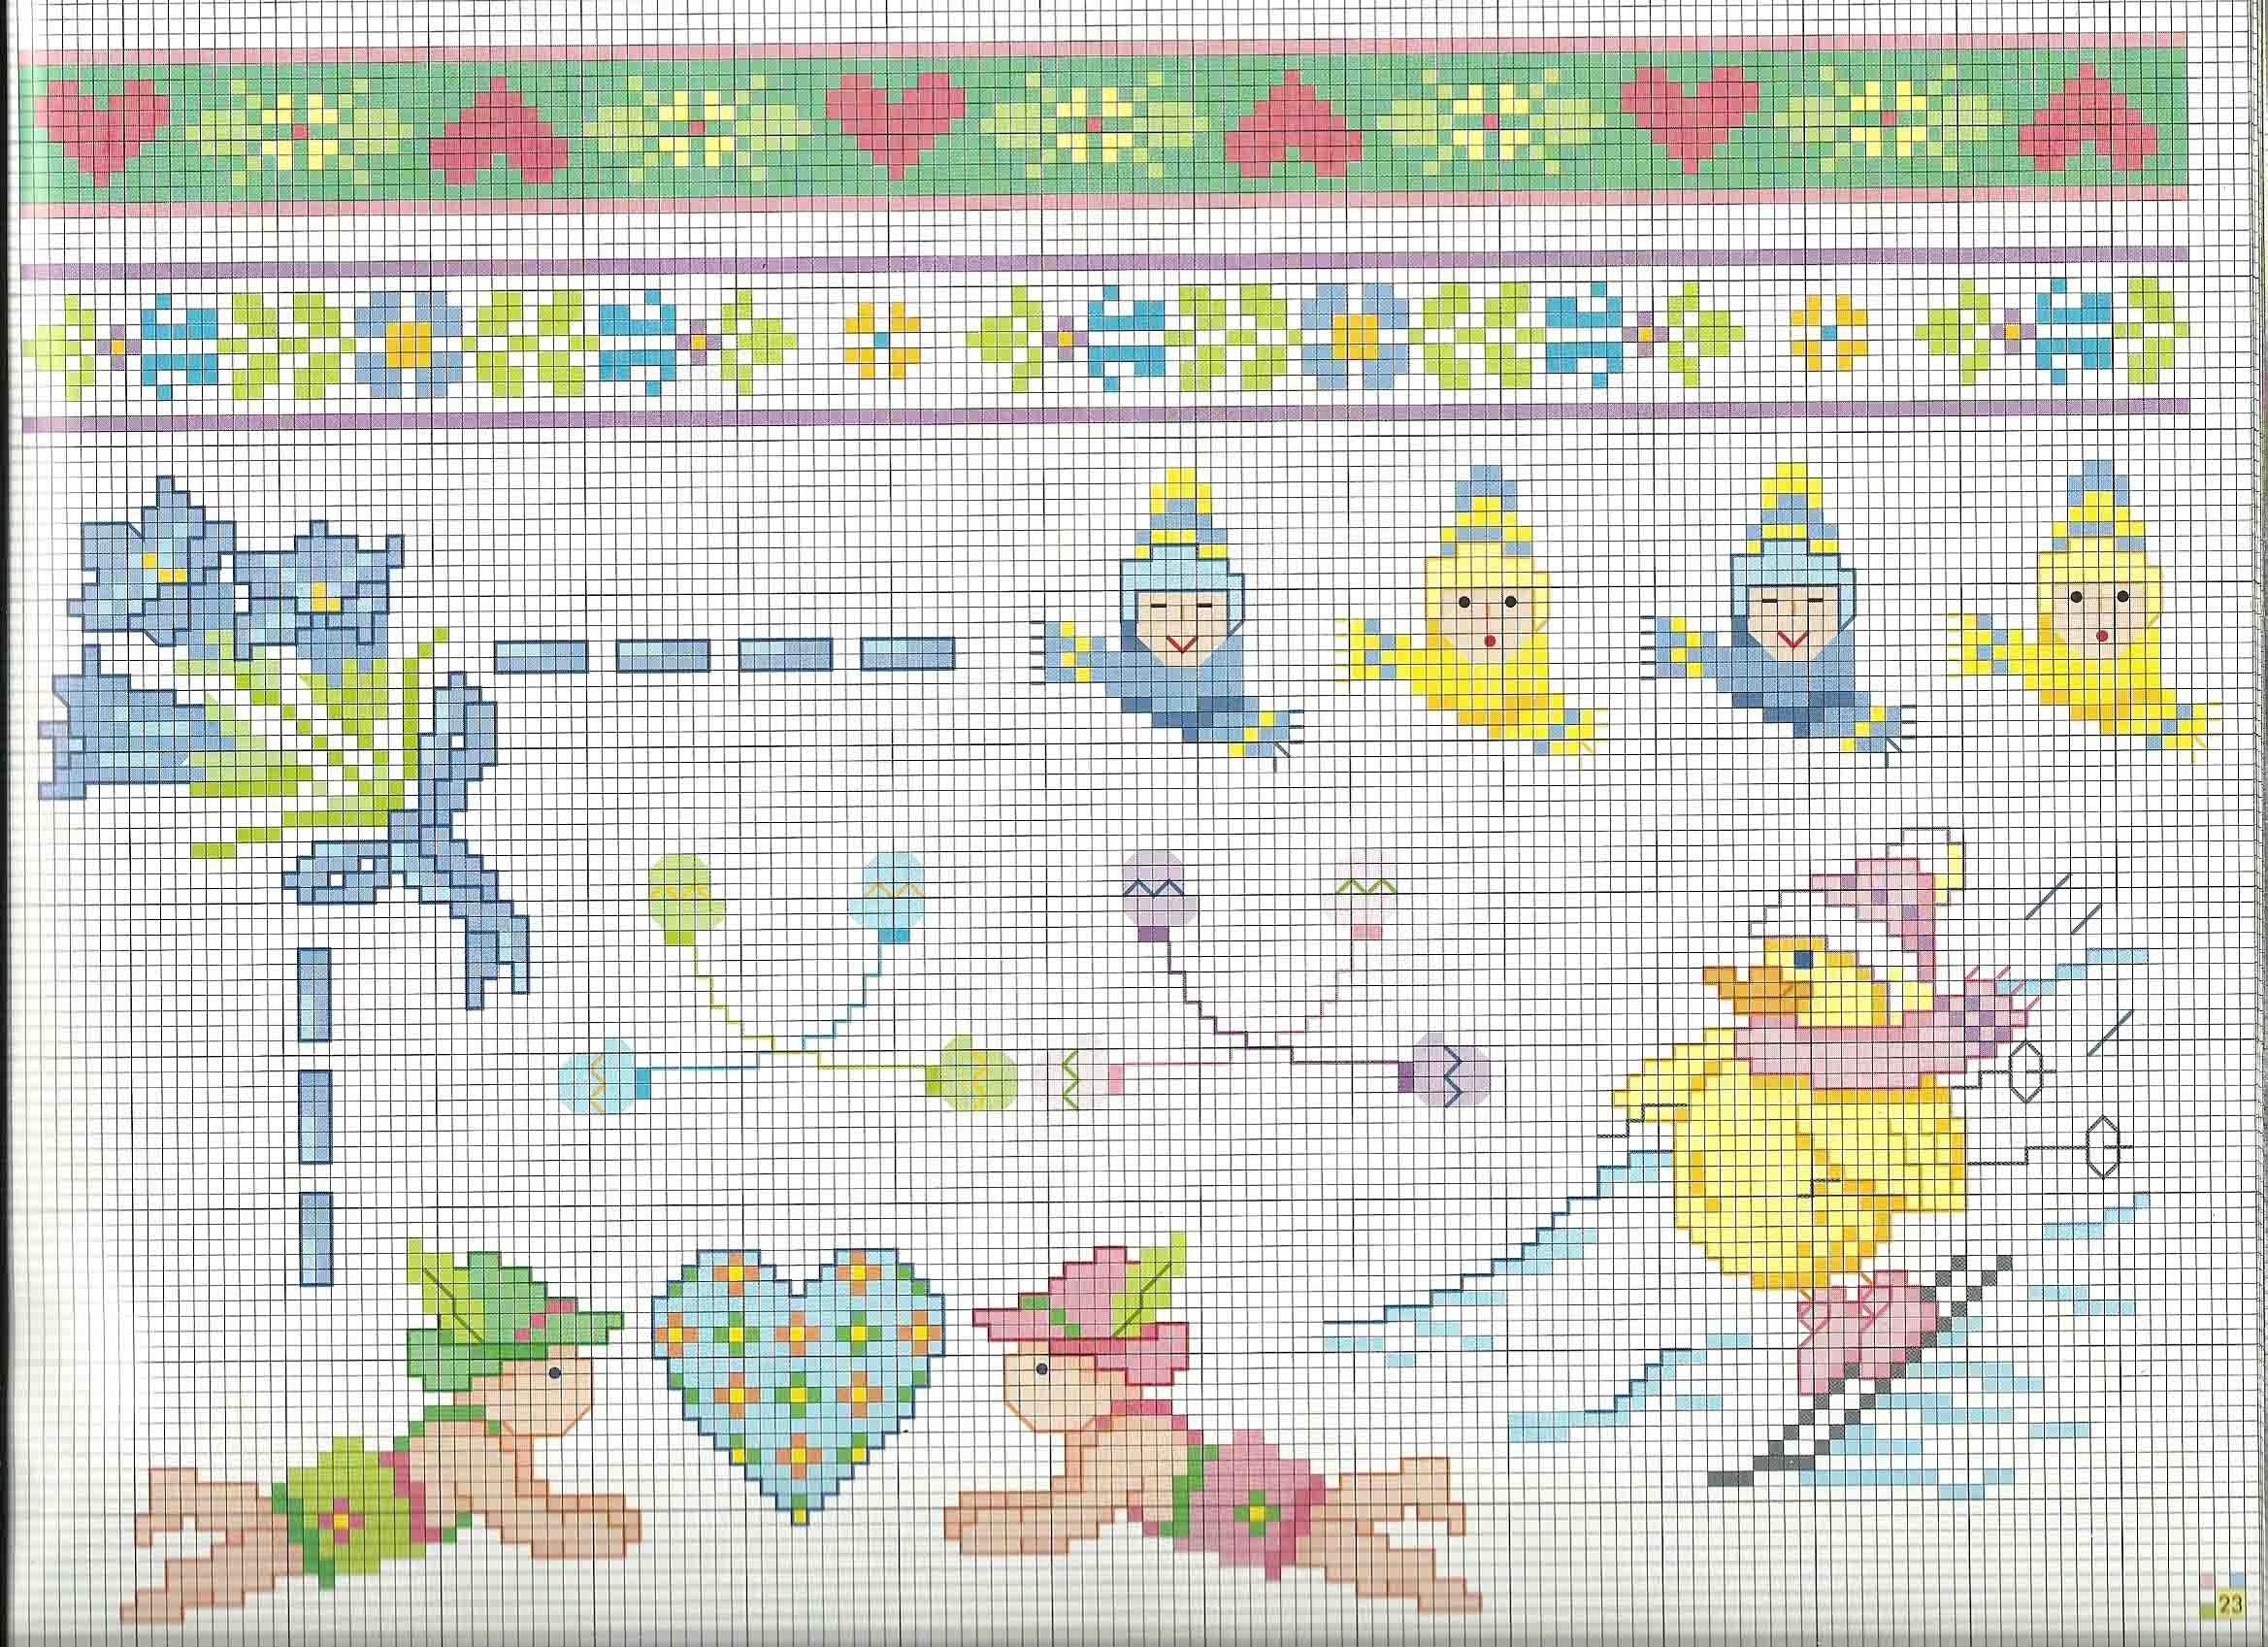 Schemi punto croce copertine lenzuolini beb sulla neve for Lenzuolini punto croce schemi